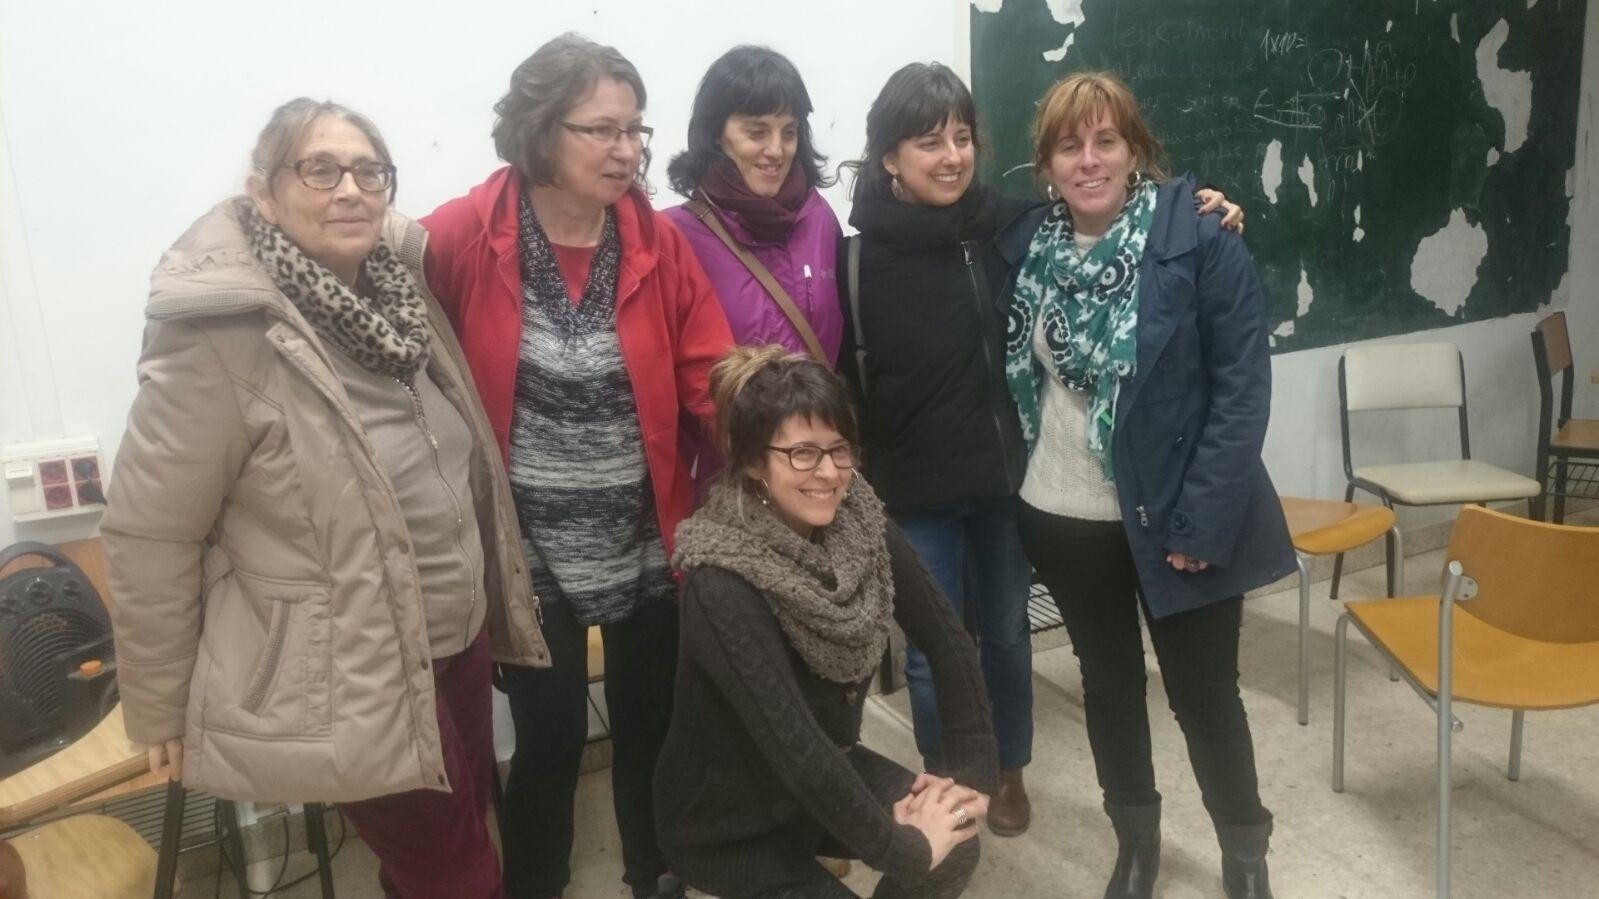 Las Feútxas: Las  feutxas  con  Arantza  Rojas